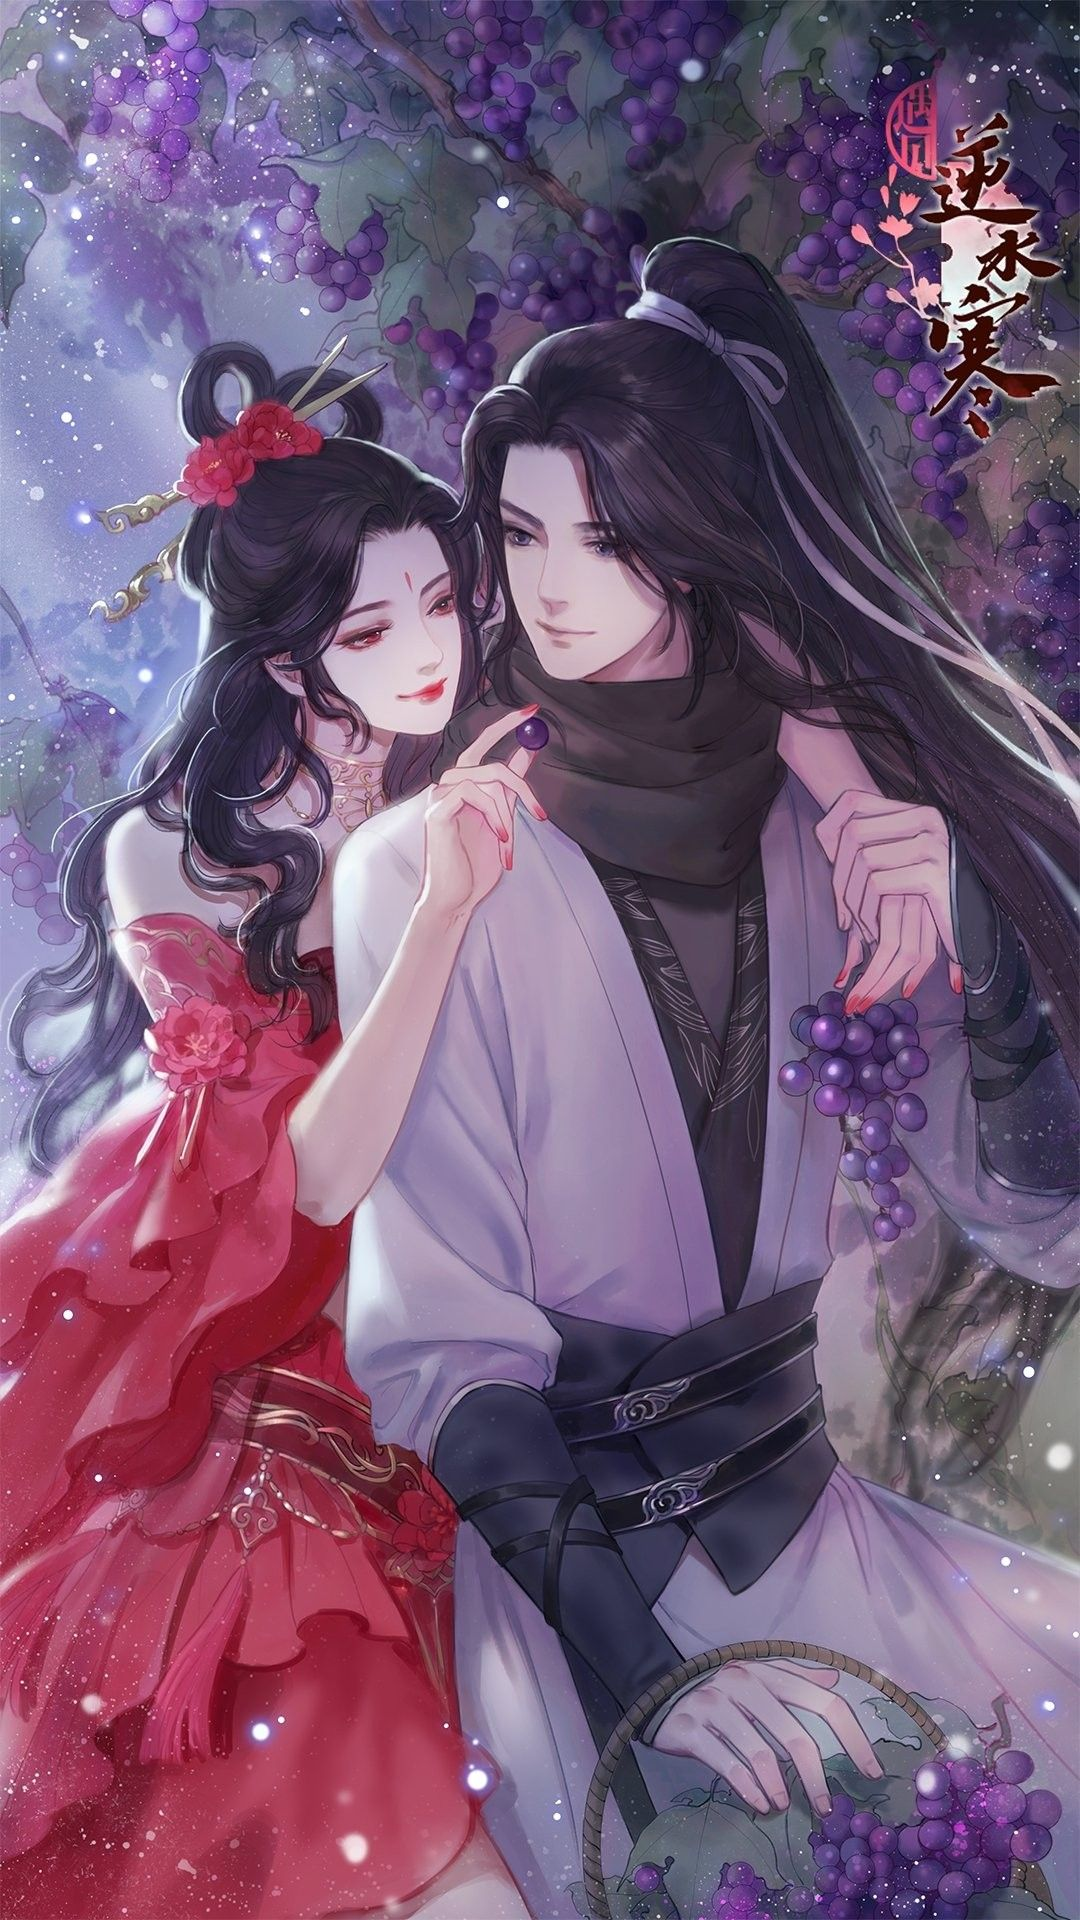 Pin Oleh Yukitrang Di Game Gadis Fantasi Gambar Pasangan Anime Pasangan Animasi